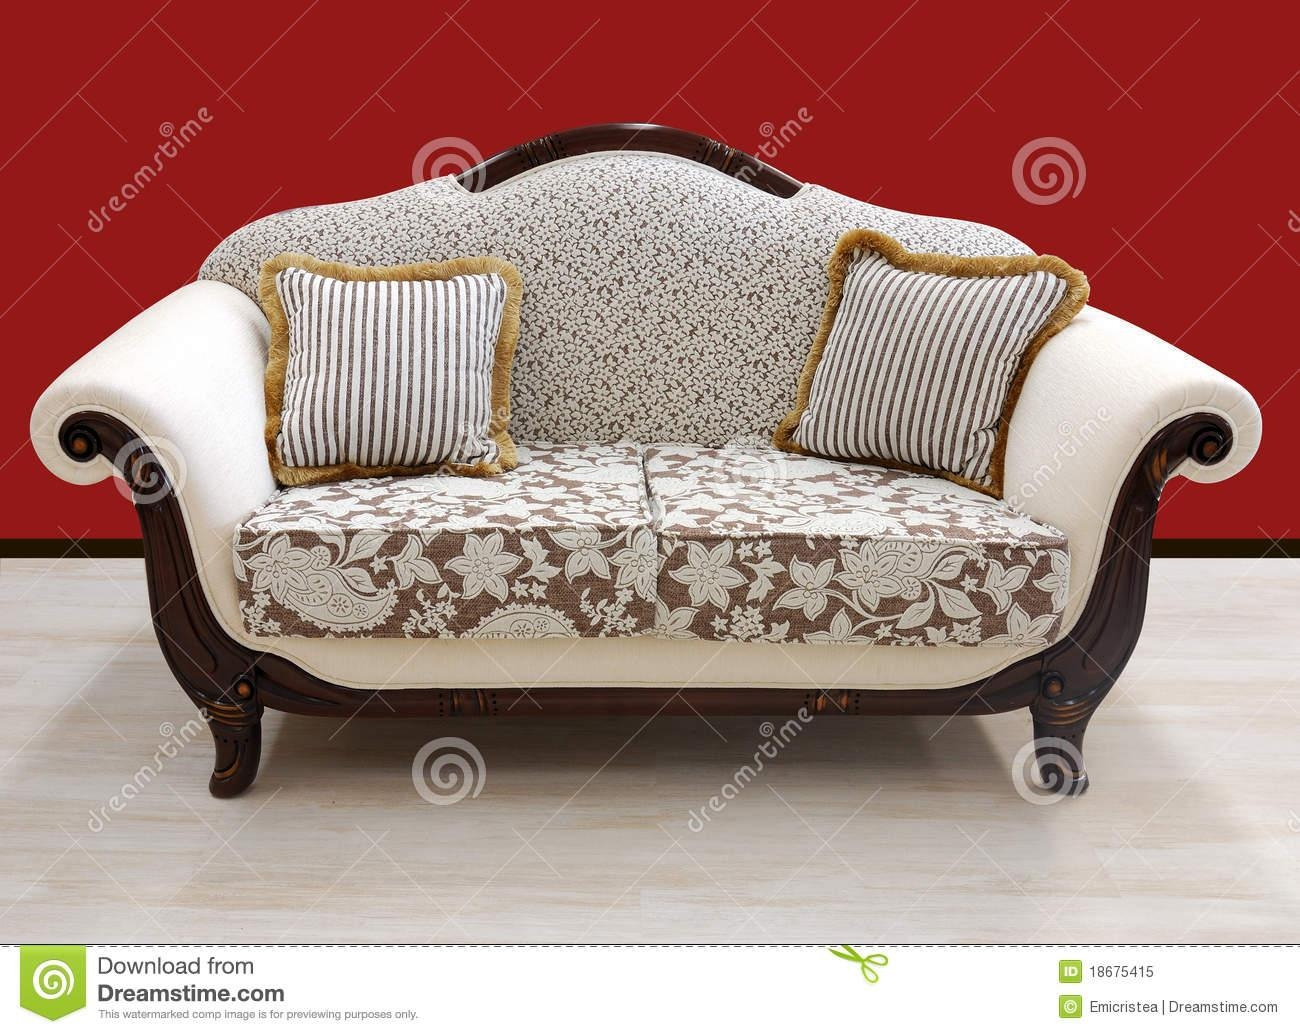 Vintage Sofa Styles Vintage Sofa Styles Thesofa - Thesofa in Vintage Sofa Styles